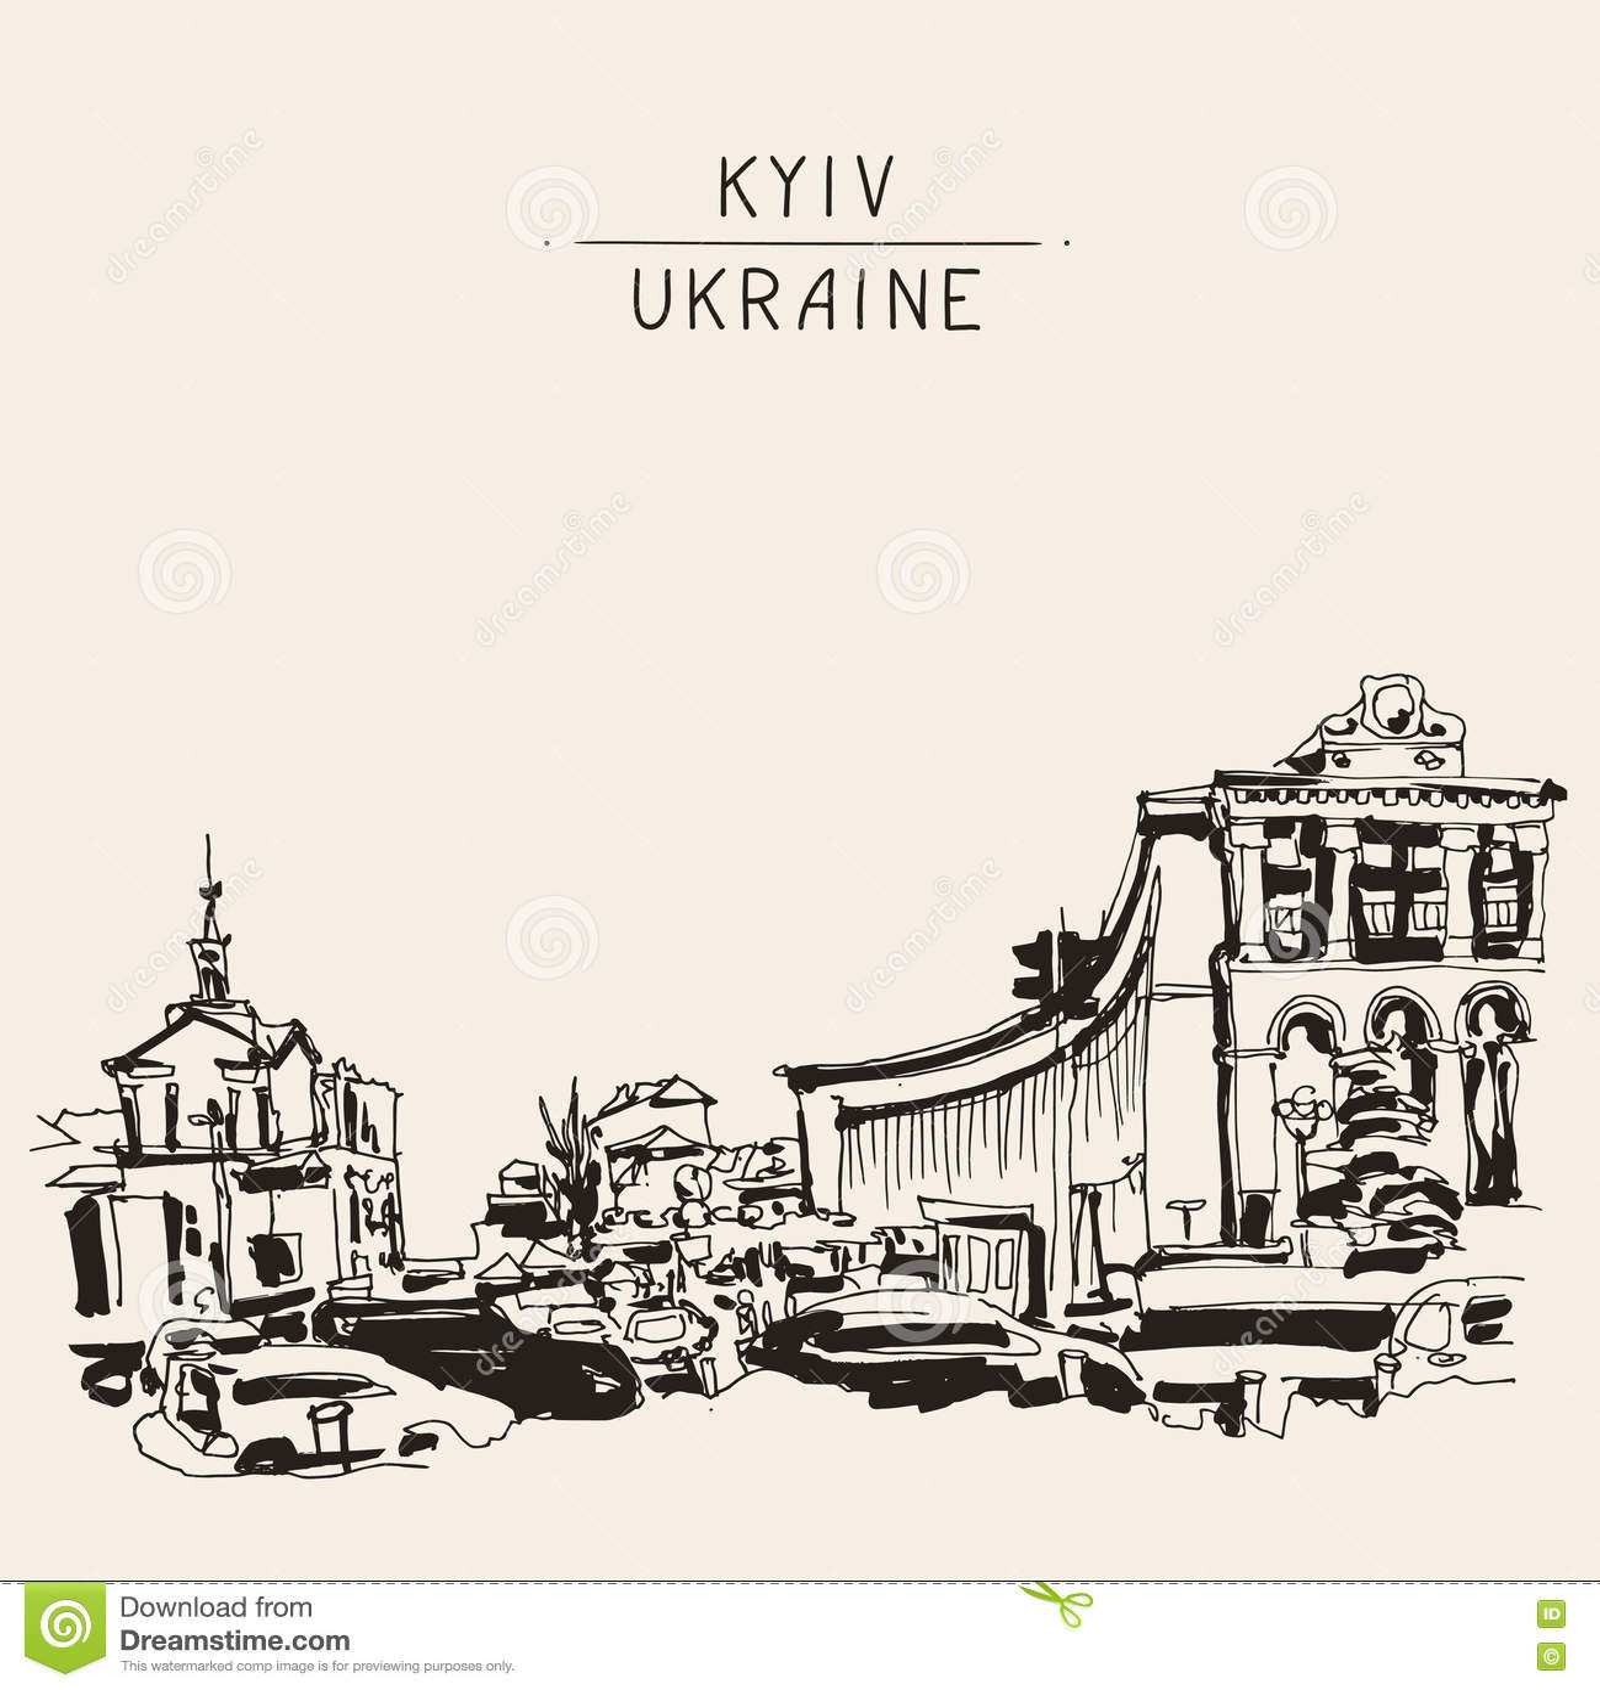 Marker drawing of Khreshchatyk the main street of the Ukrainian